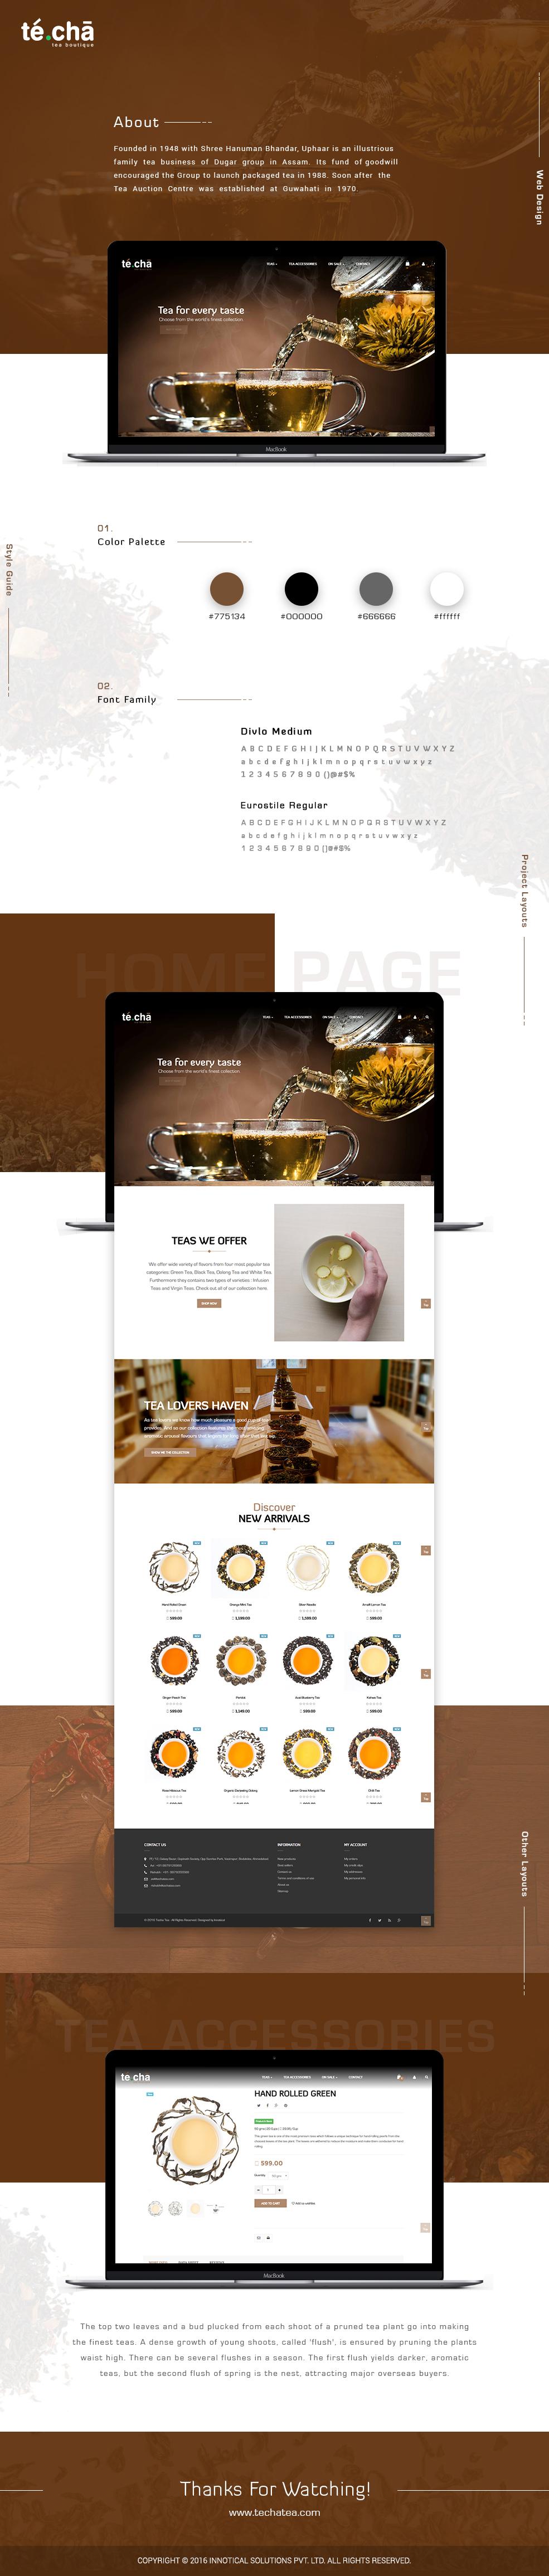 UI/UX Photography  Responsive Ecommerce Web Design